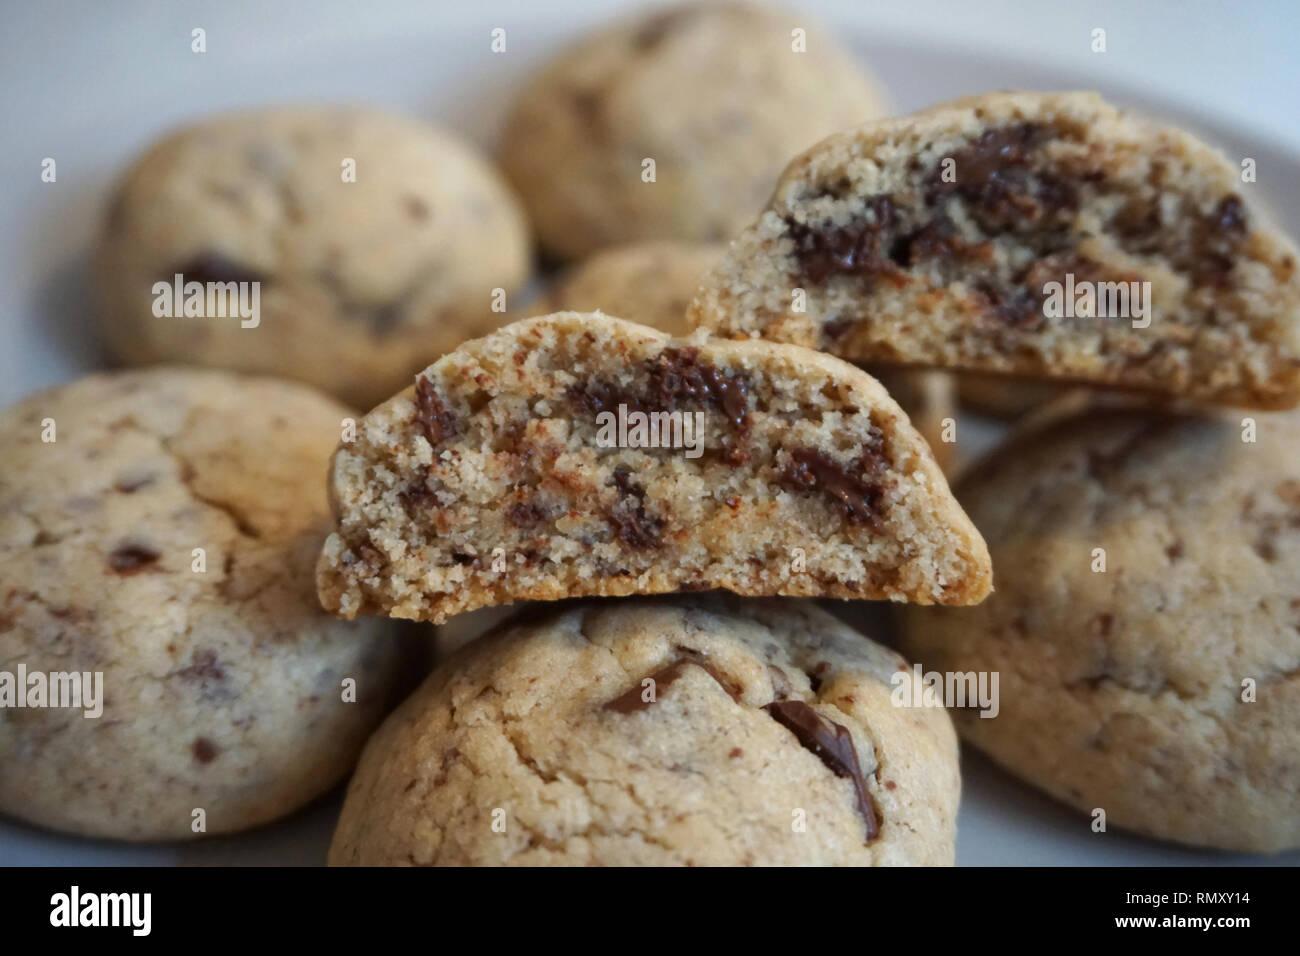 Halved cookie. Crunchy homemade tasty dessert with milk chocolate - Stock Image